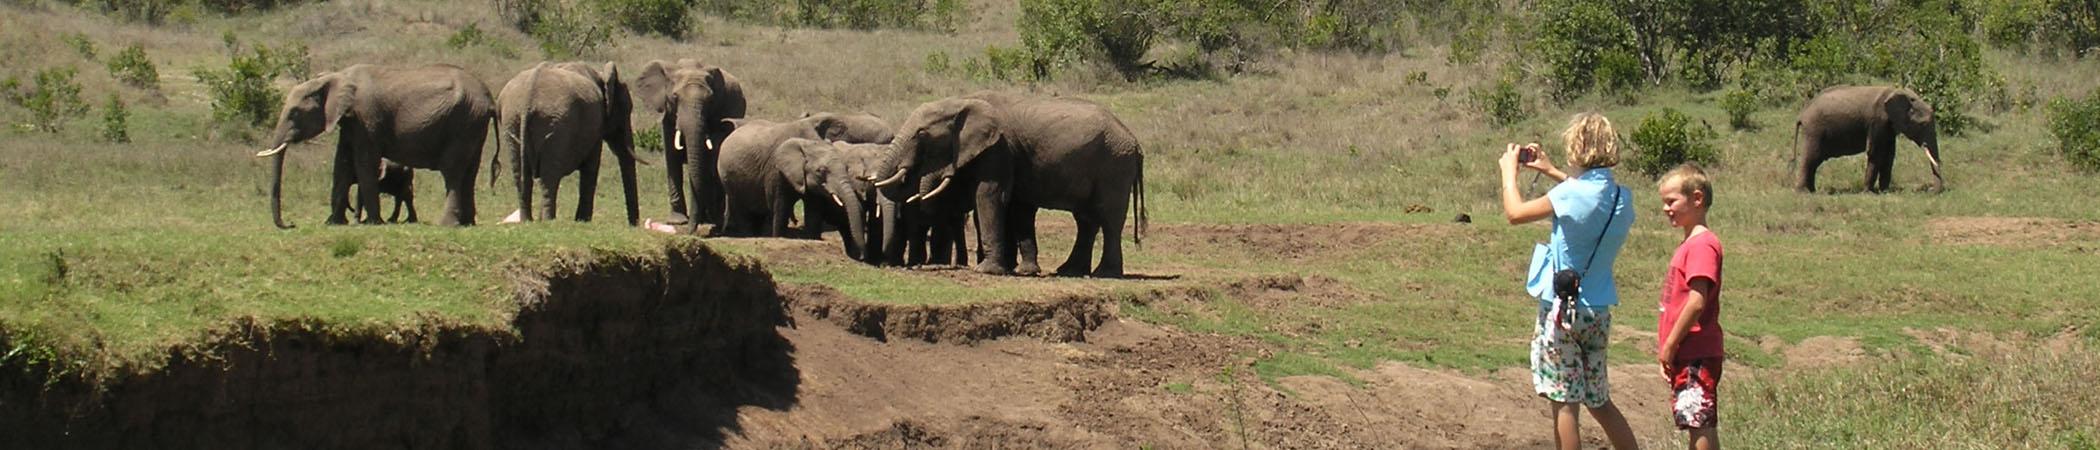 Elephant Safari Tanzania